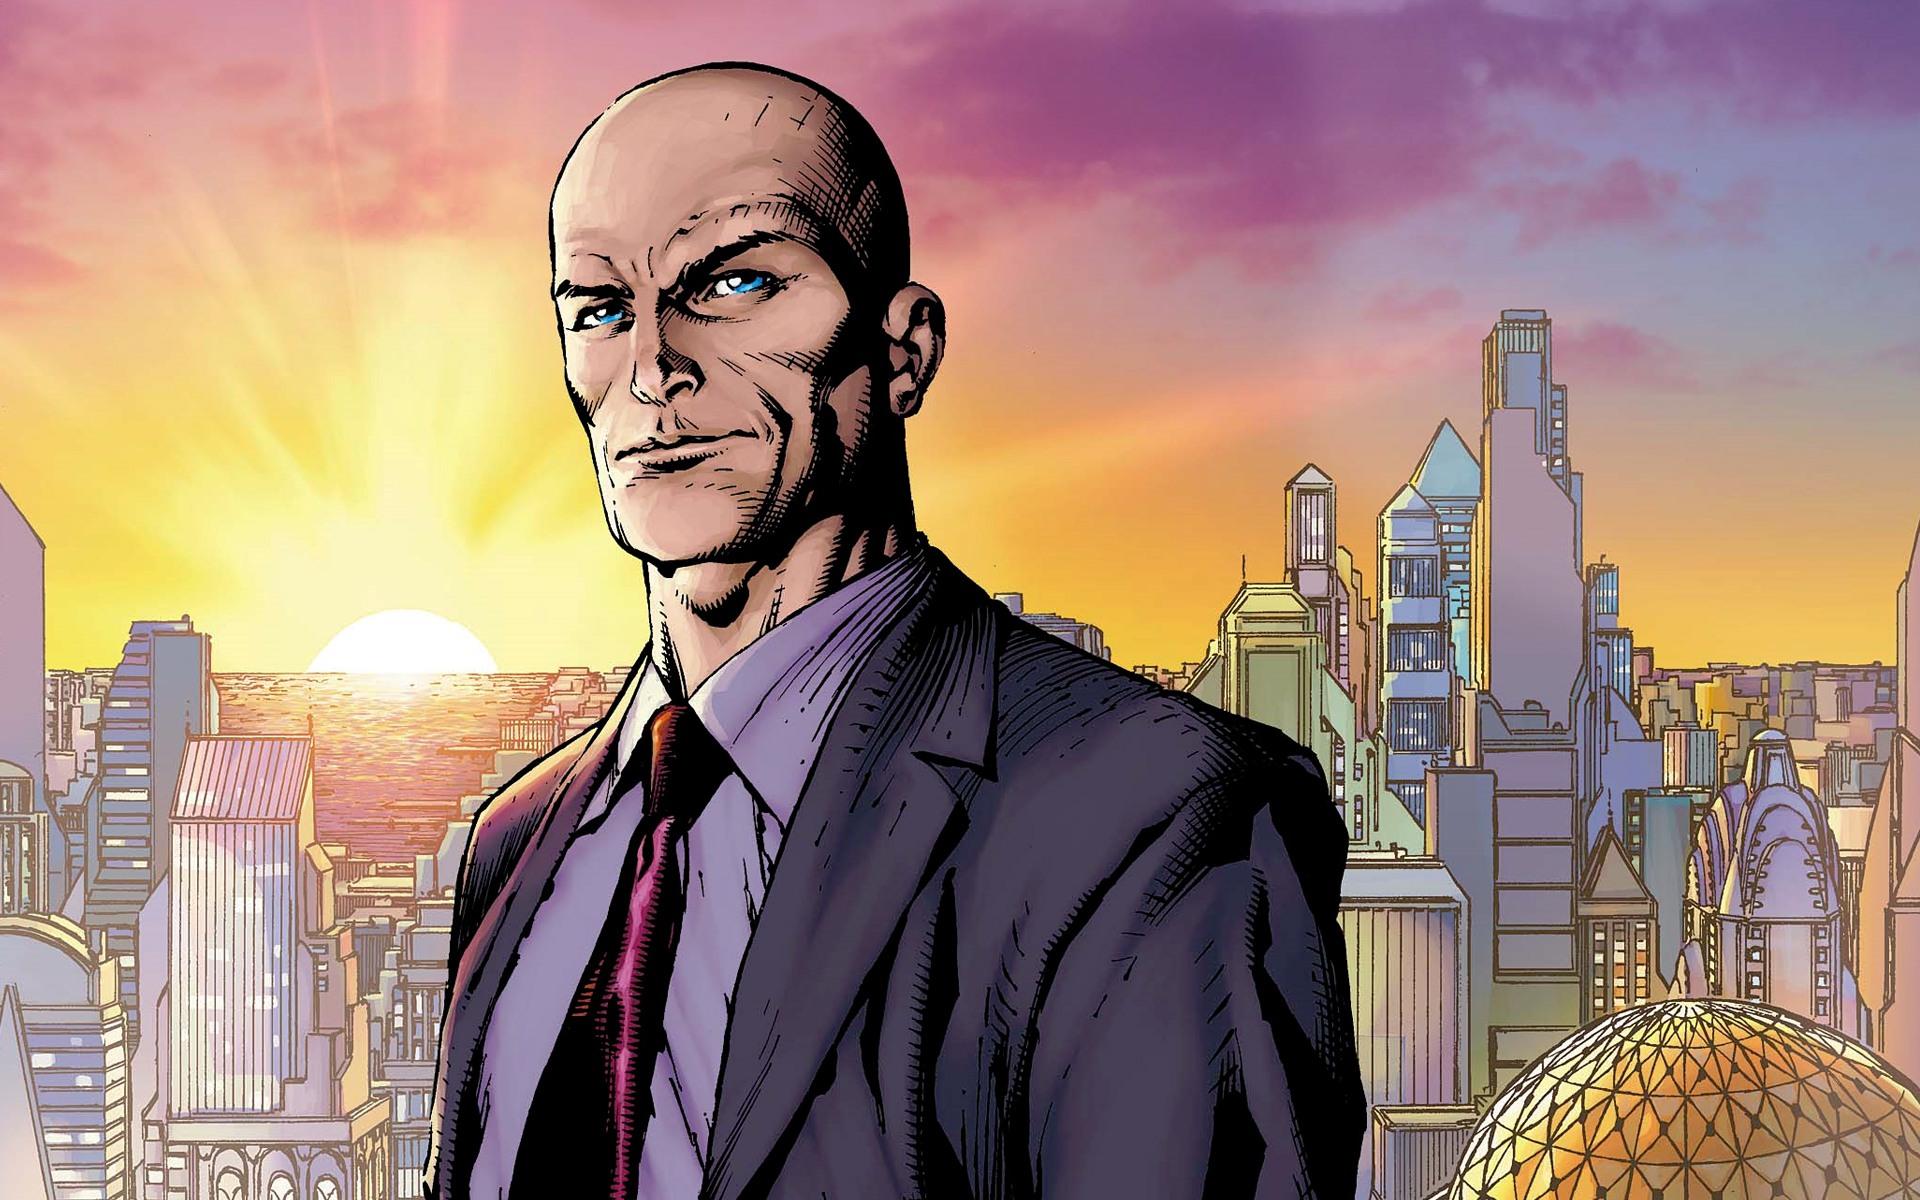 Supergirl Season 4 Lex Luthor Episode Trailer And Details Den Of Geek